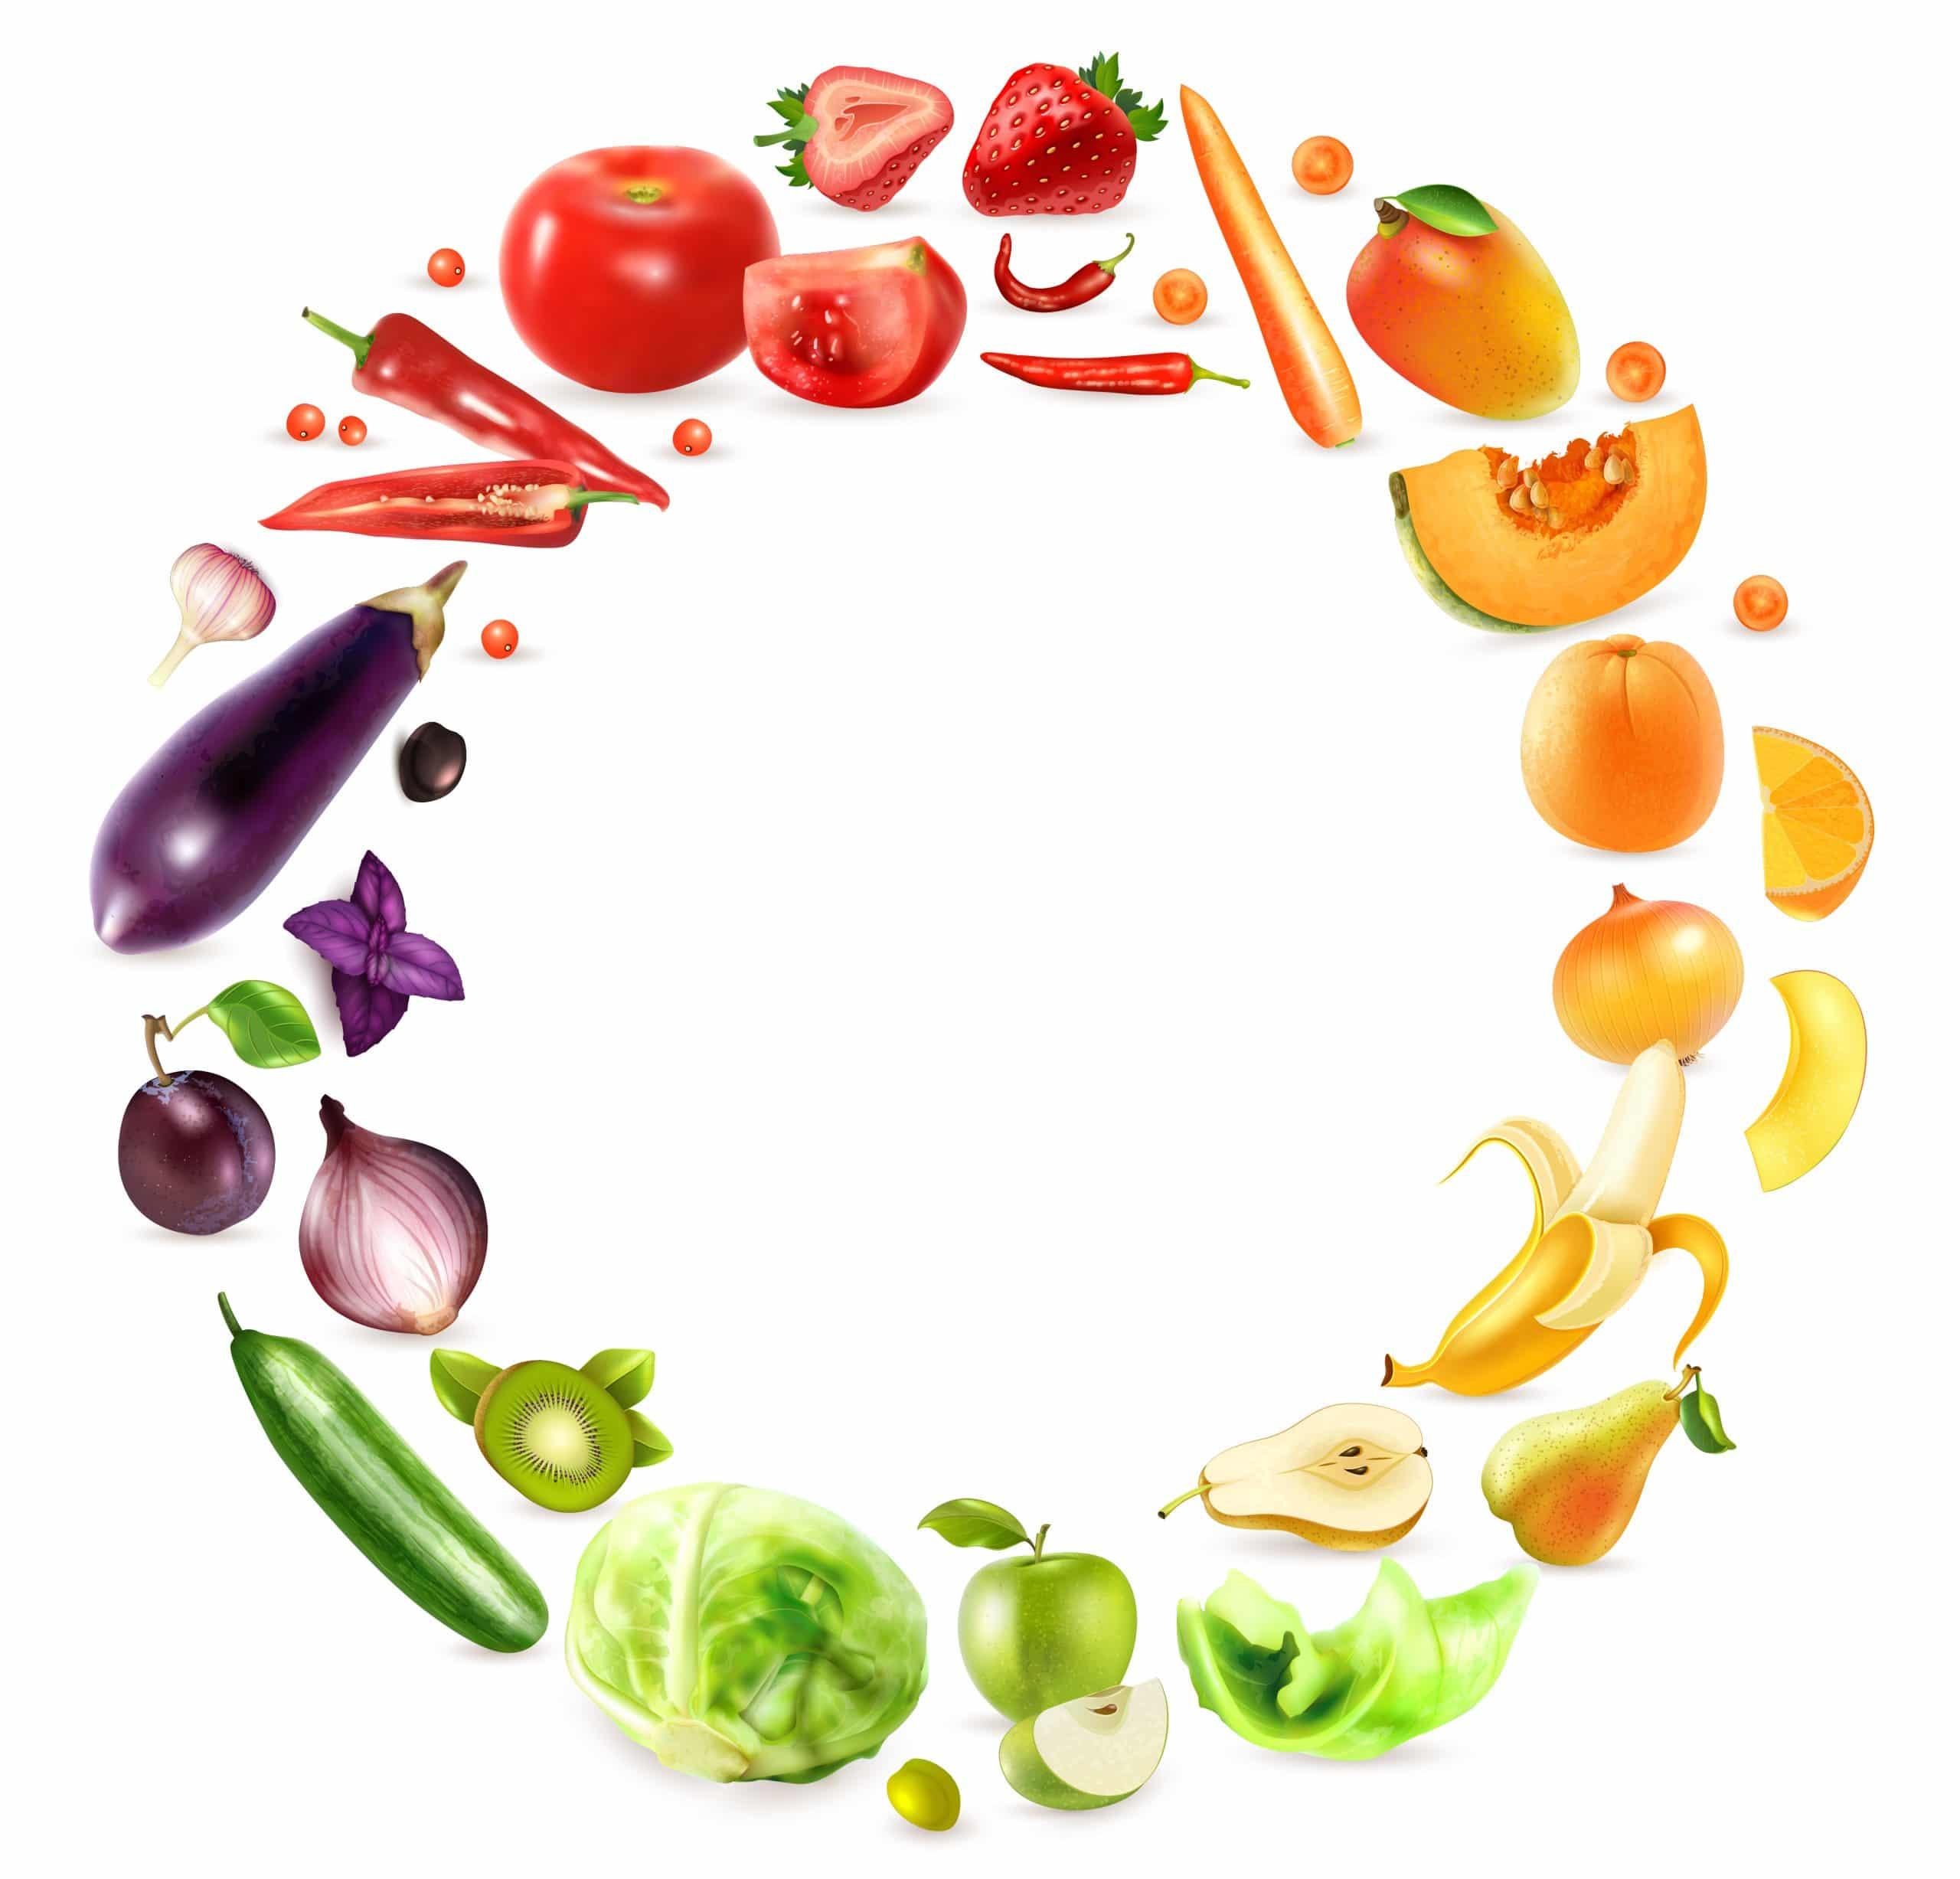 arc en ciel de fruits et légumes